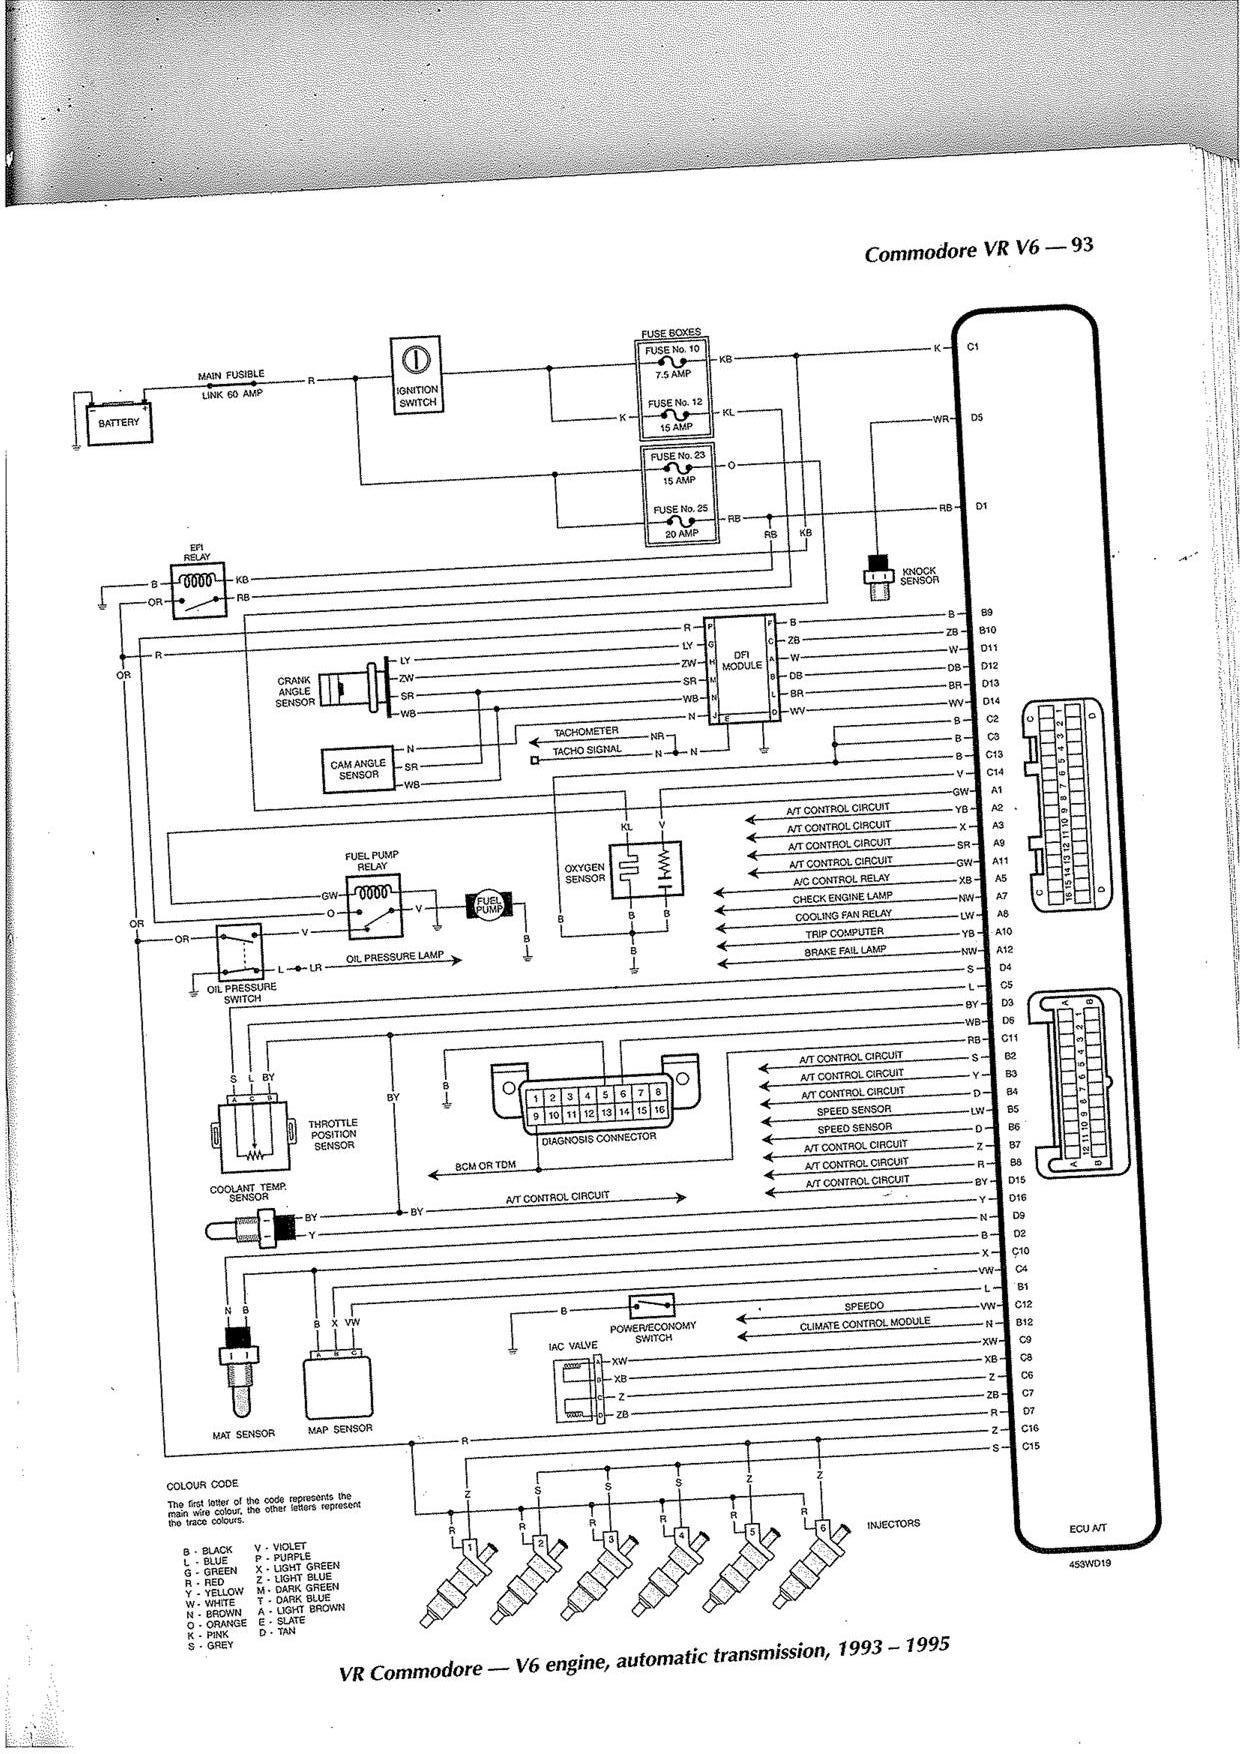 Vn Commodore Stoplight Wiring Diagram Diagram] Stereo Wiring Diagram Vt Modore Full Version Hd Of Vn Commodore Stoplight Wiring Diagram